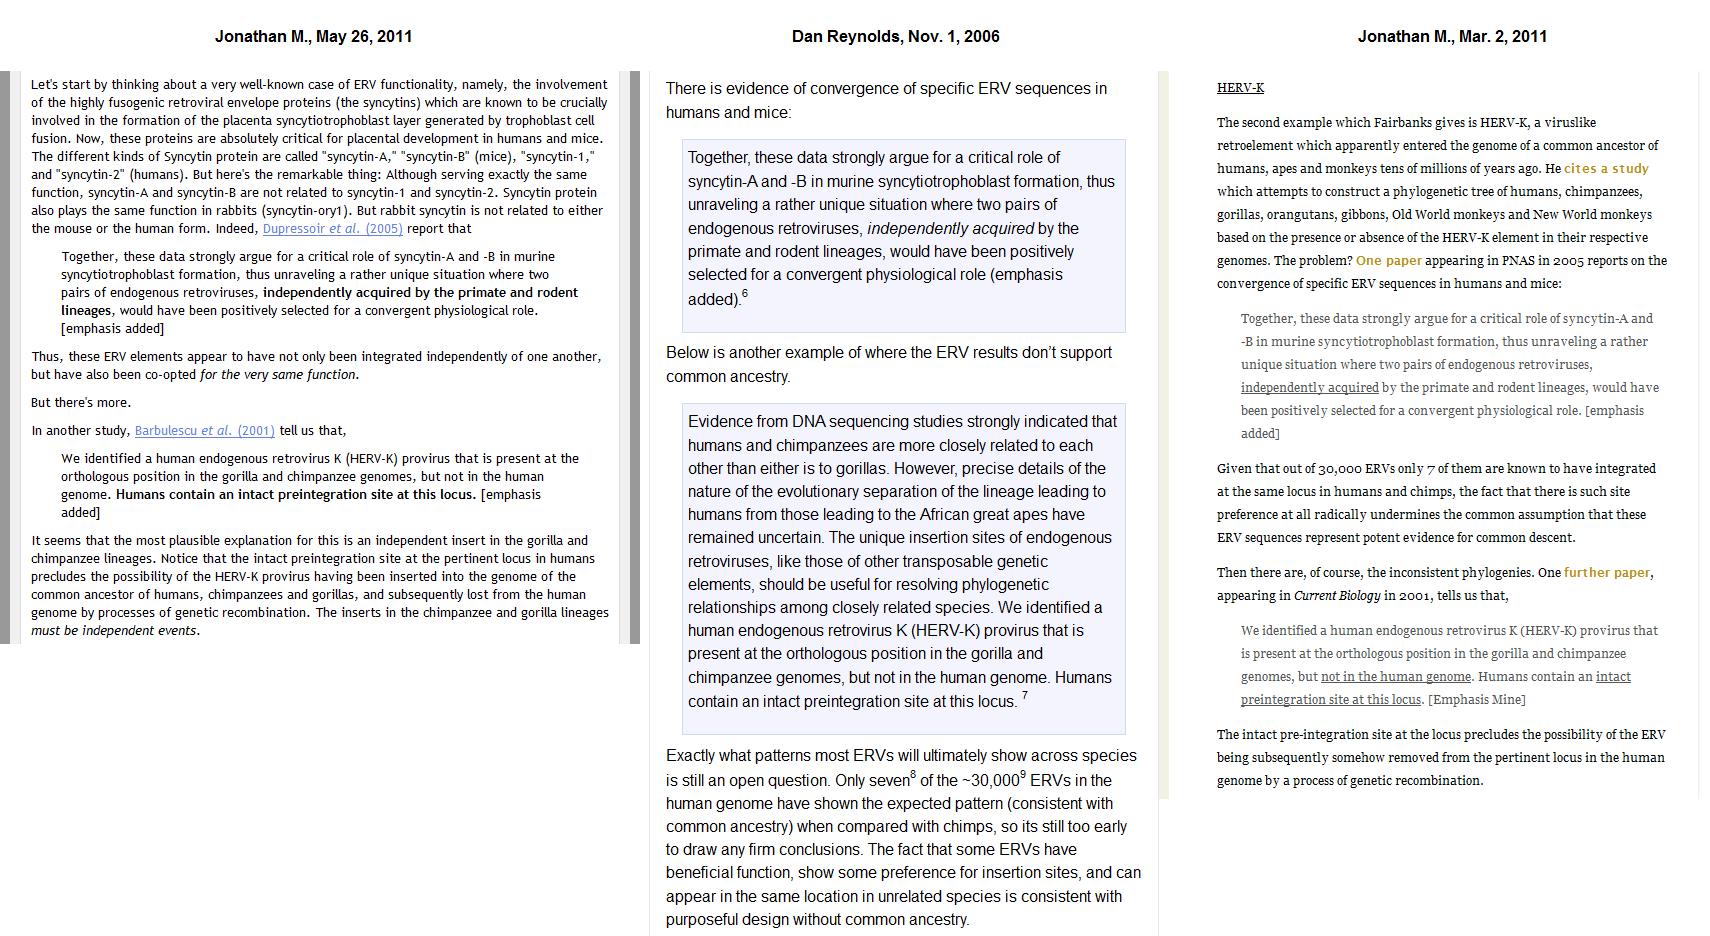 022 Essay Example Paraphrase Paraphrasing Essays Doit Comparison Quotes In Academic Examples Of Stirring Means On Criticism Topics Full